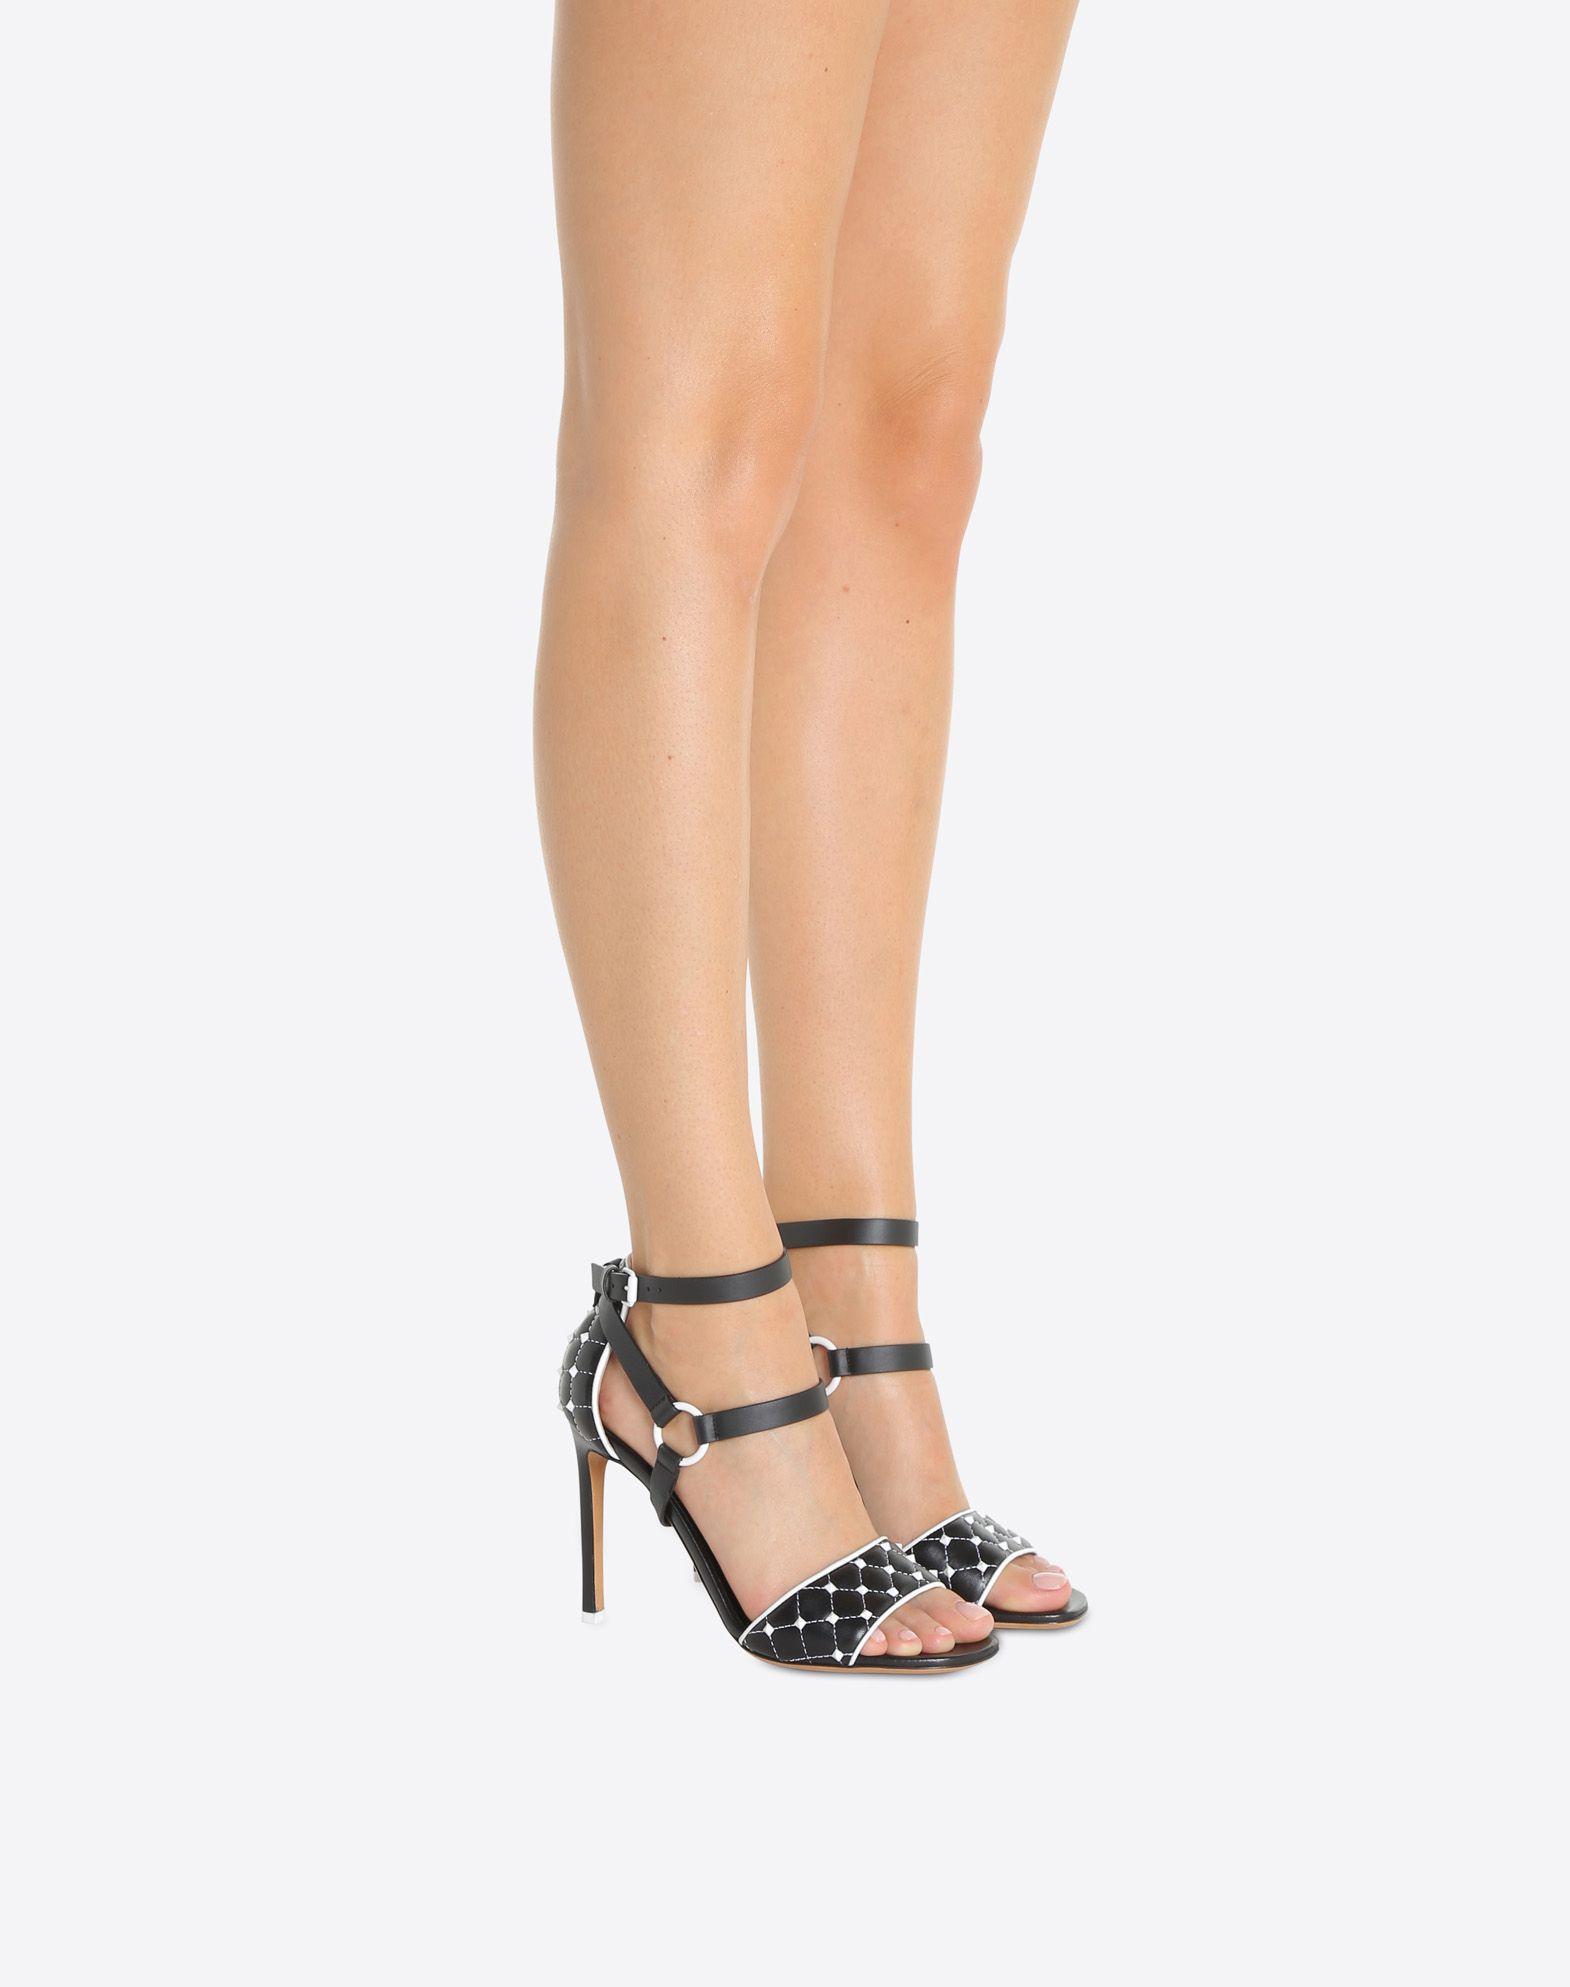 VALENTINO GARAVANI Free Rockstud Spike 凉鞋 SANDALS TACCO ALTO D a